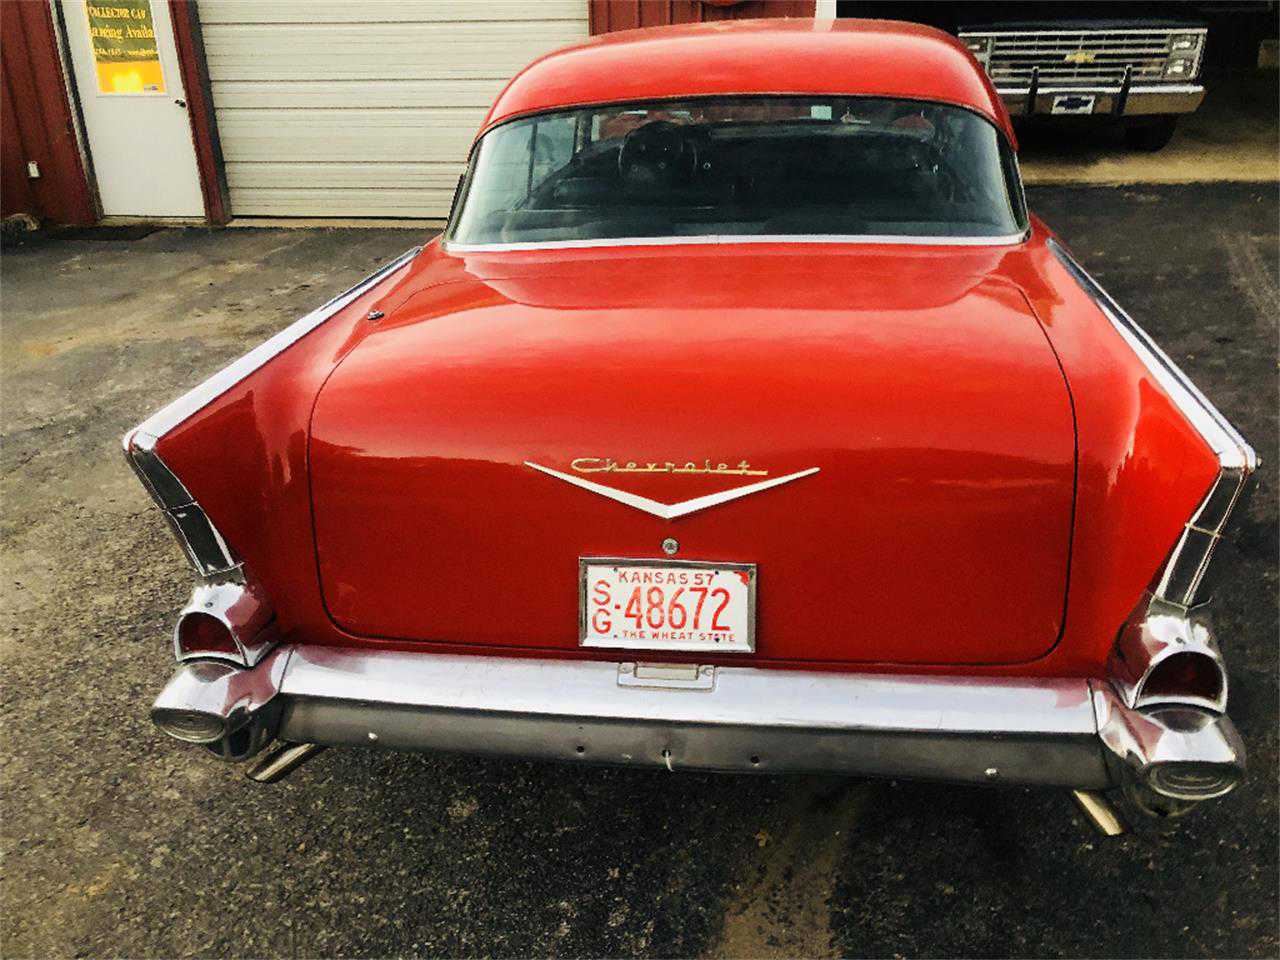 1957 Chevrolet Bel Air For Sale In Wilson Ok Vc57k150765 Vin Tag